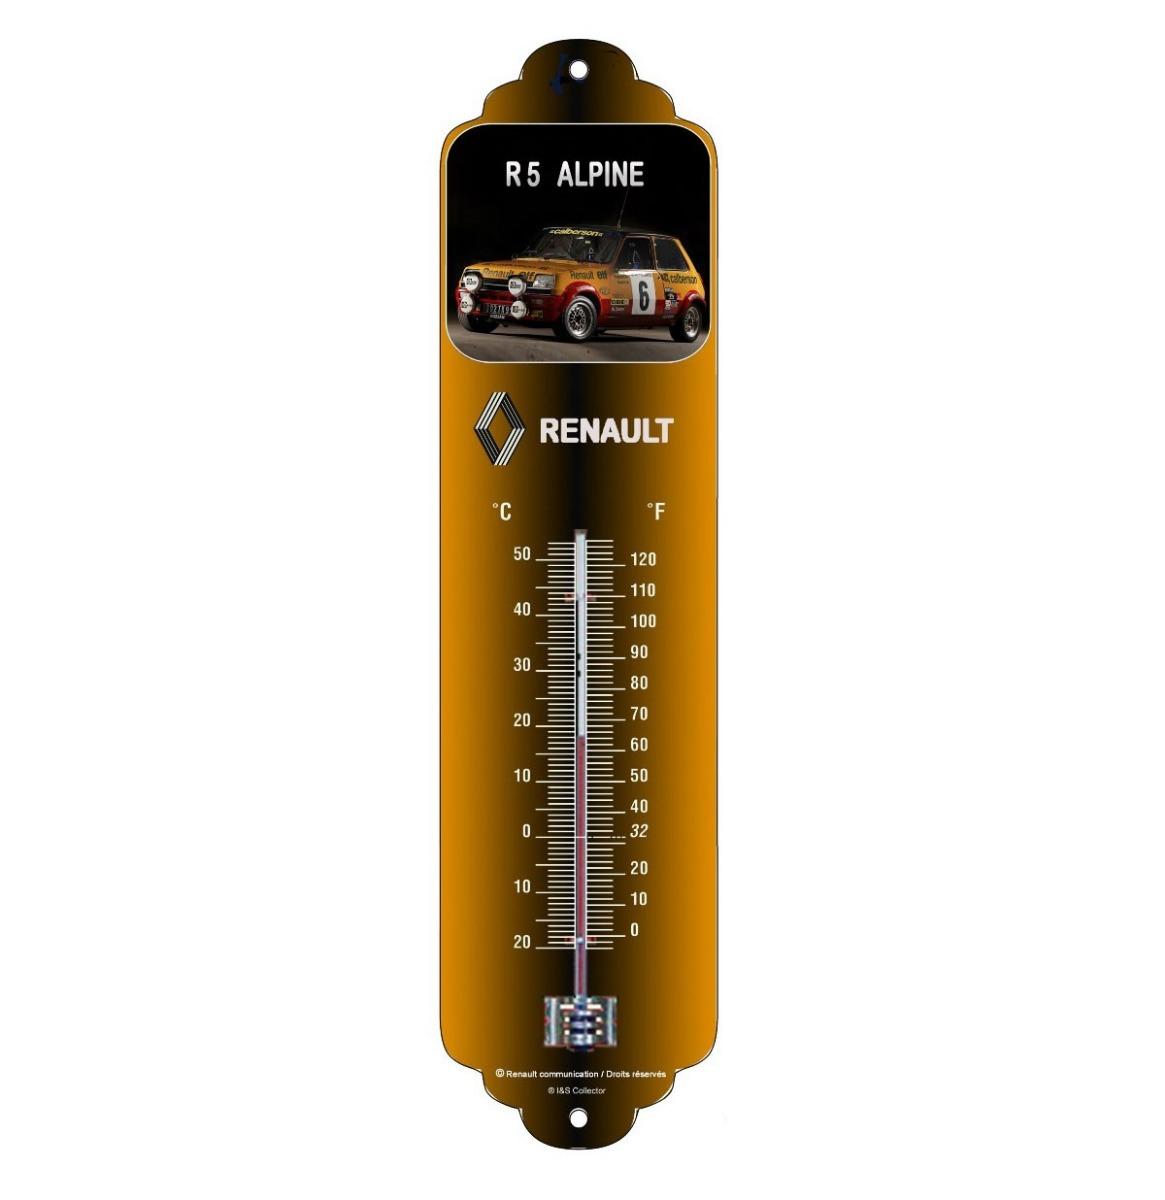 Renault R5 Alpine Thermometer